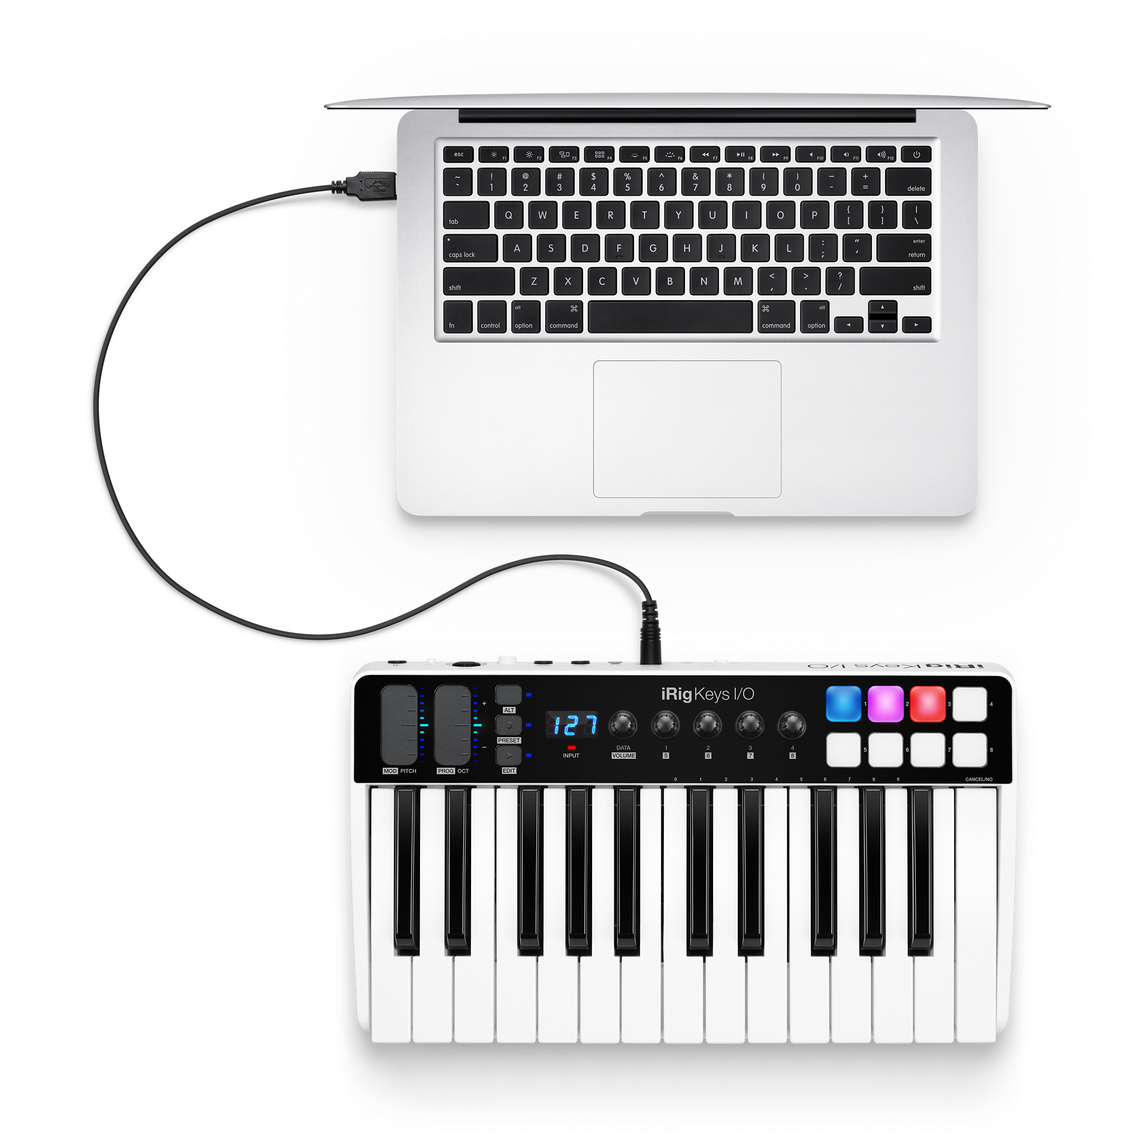 IK Multimedia's iRig Keys IO MIDI 25 Clavier MIDI